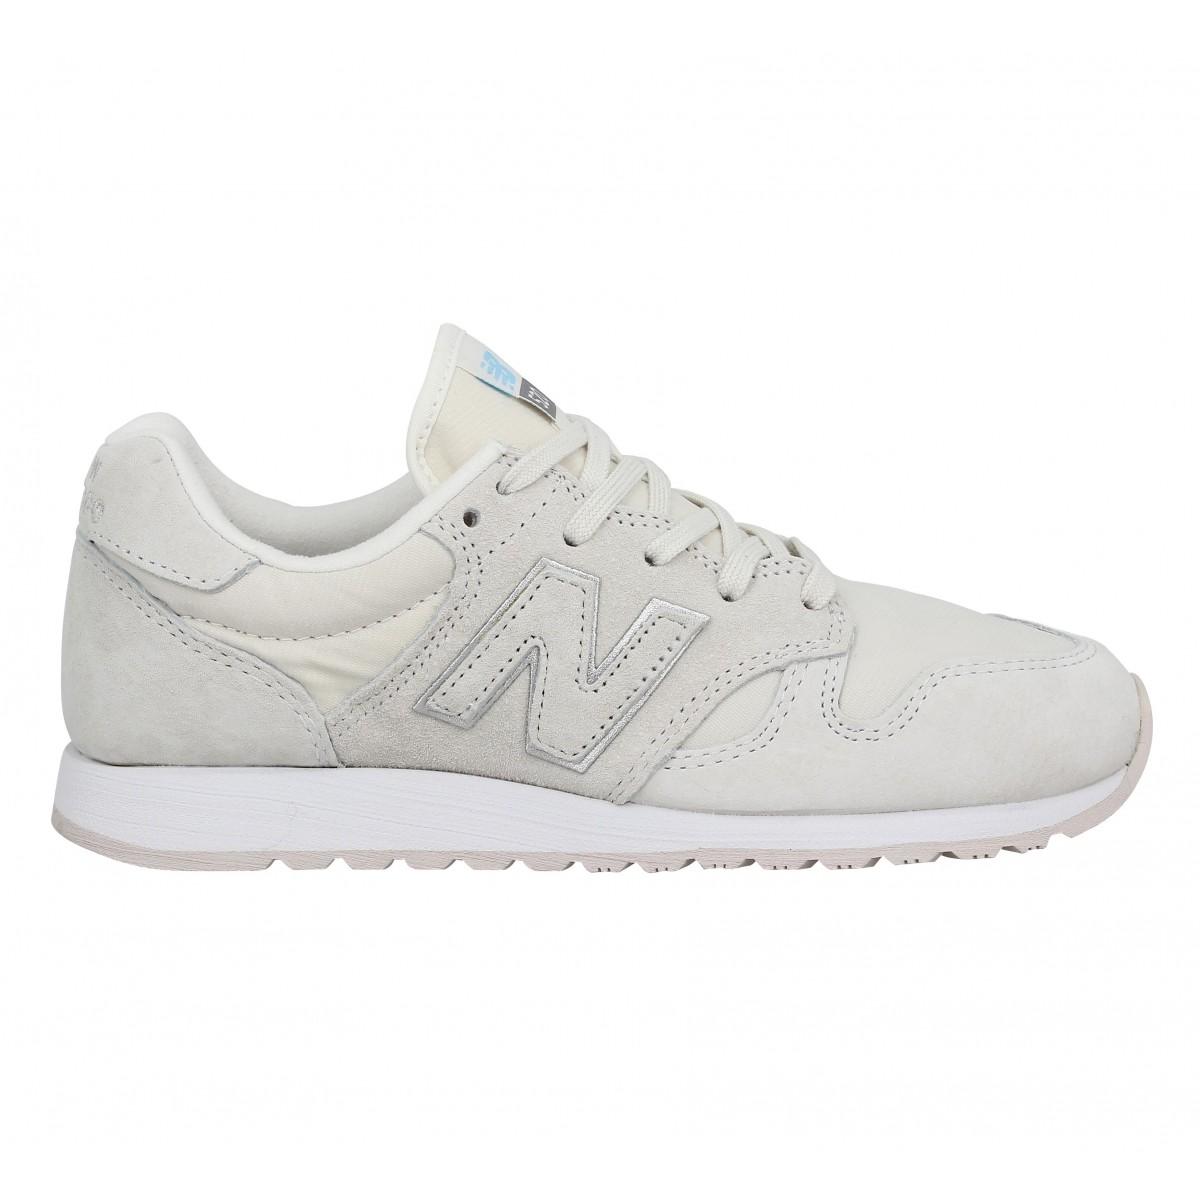 New Balance Chaussures WL520 New Balance soldes   Sneakers Basses Mixte Enfant  Bleu (Navy Blazer/Indigo Bunting/Surf The 000) 2t83O9t